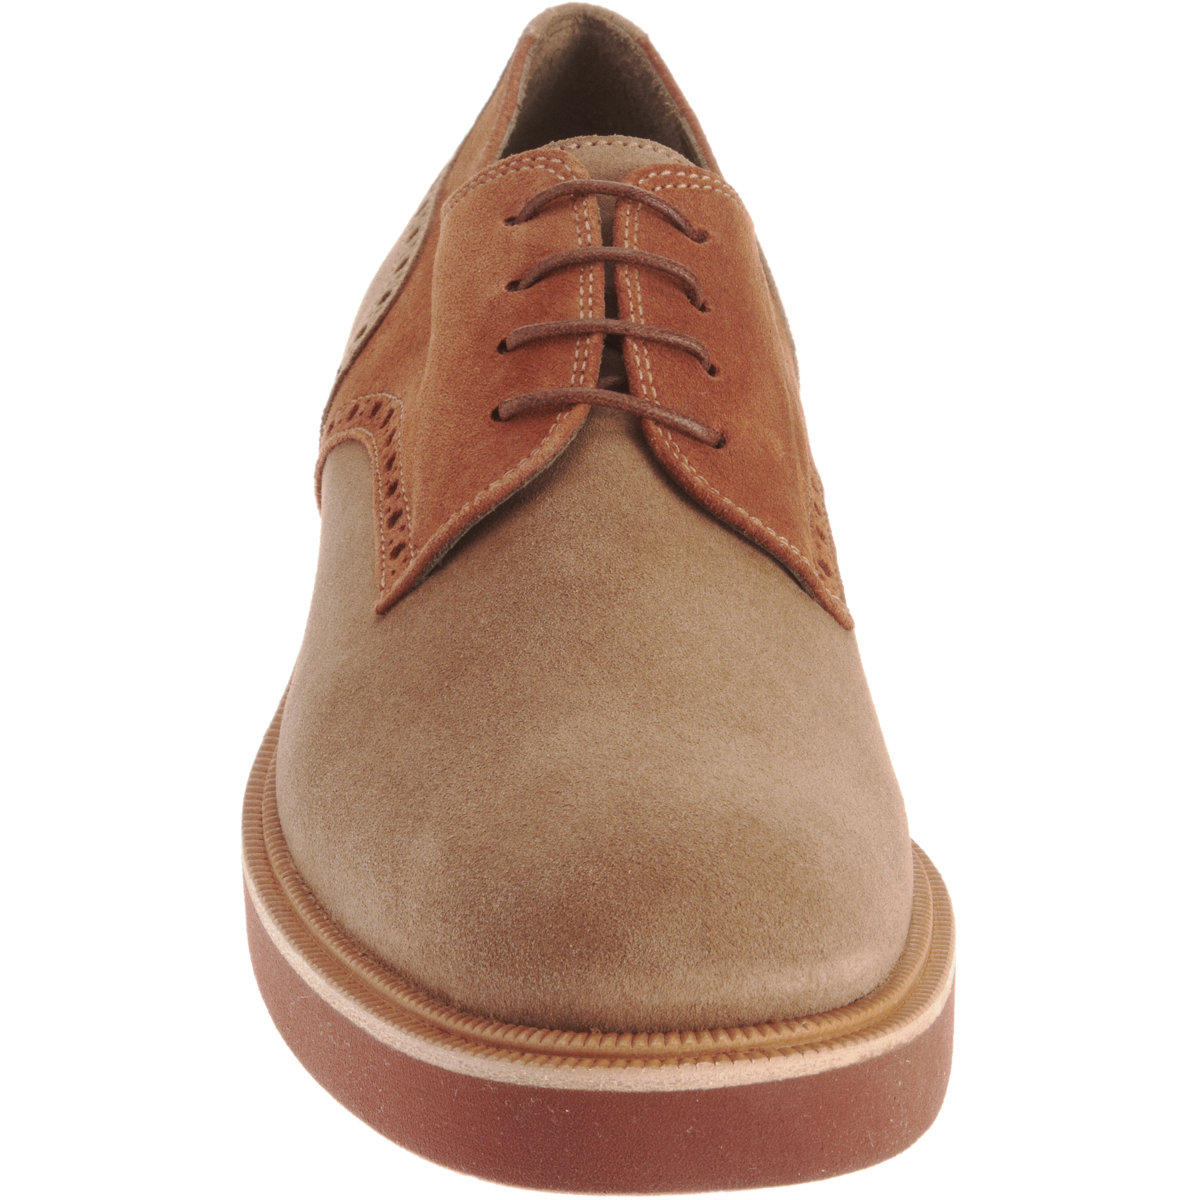 Sartore Saddle Shoe In Brown Lyst